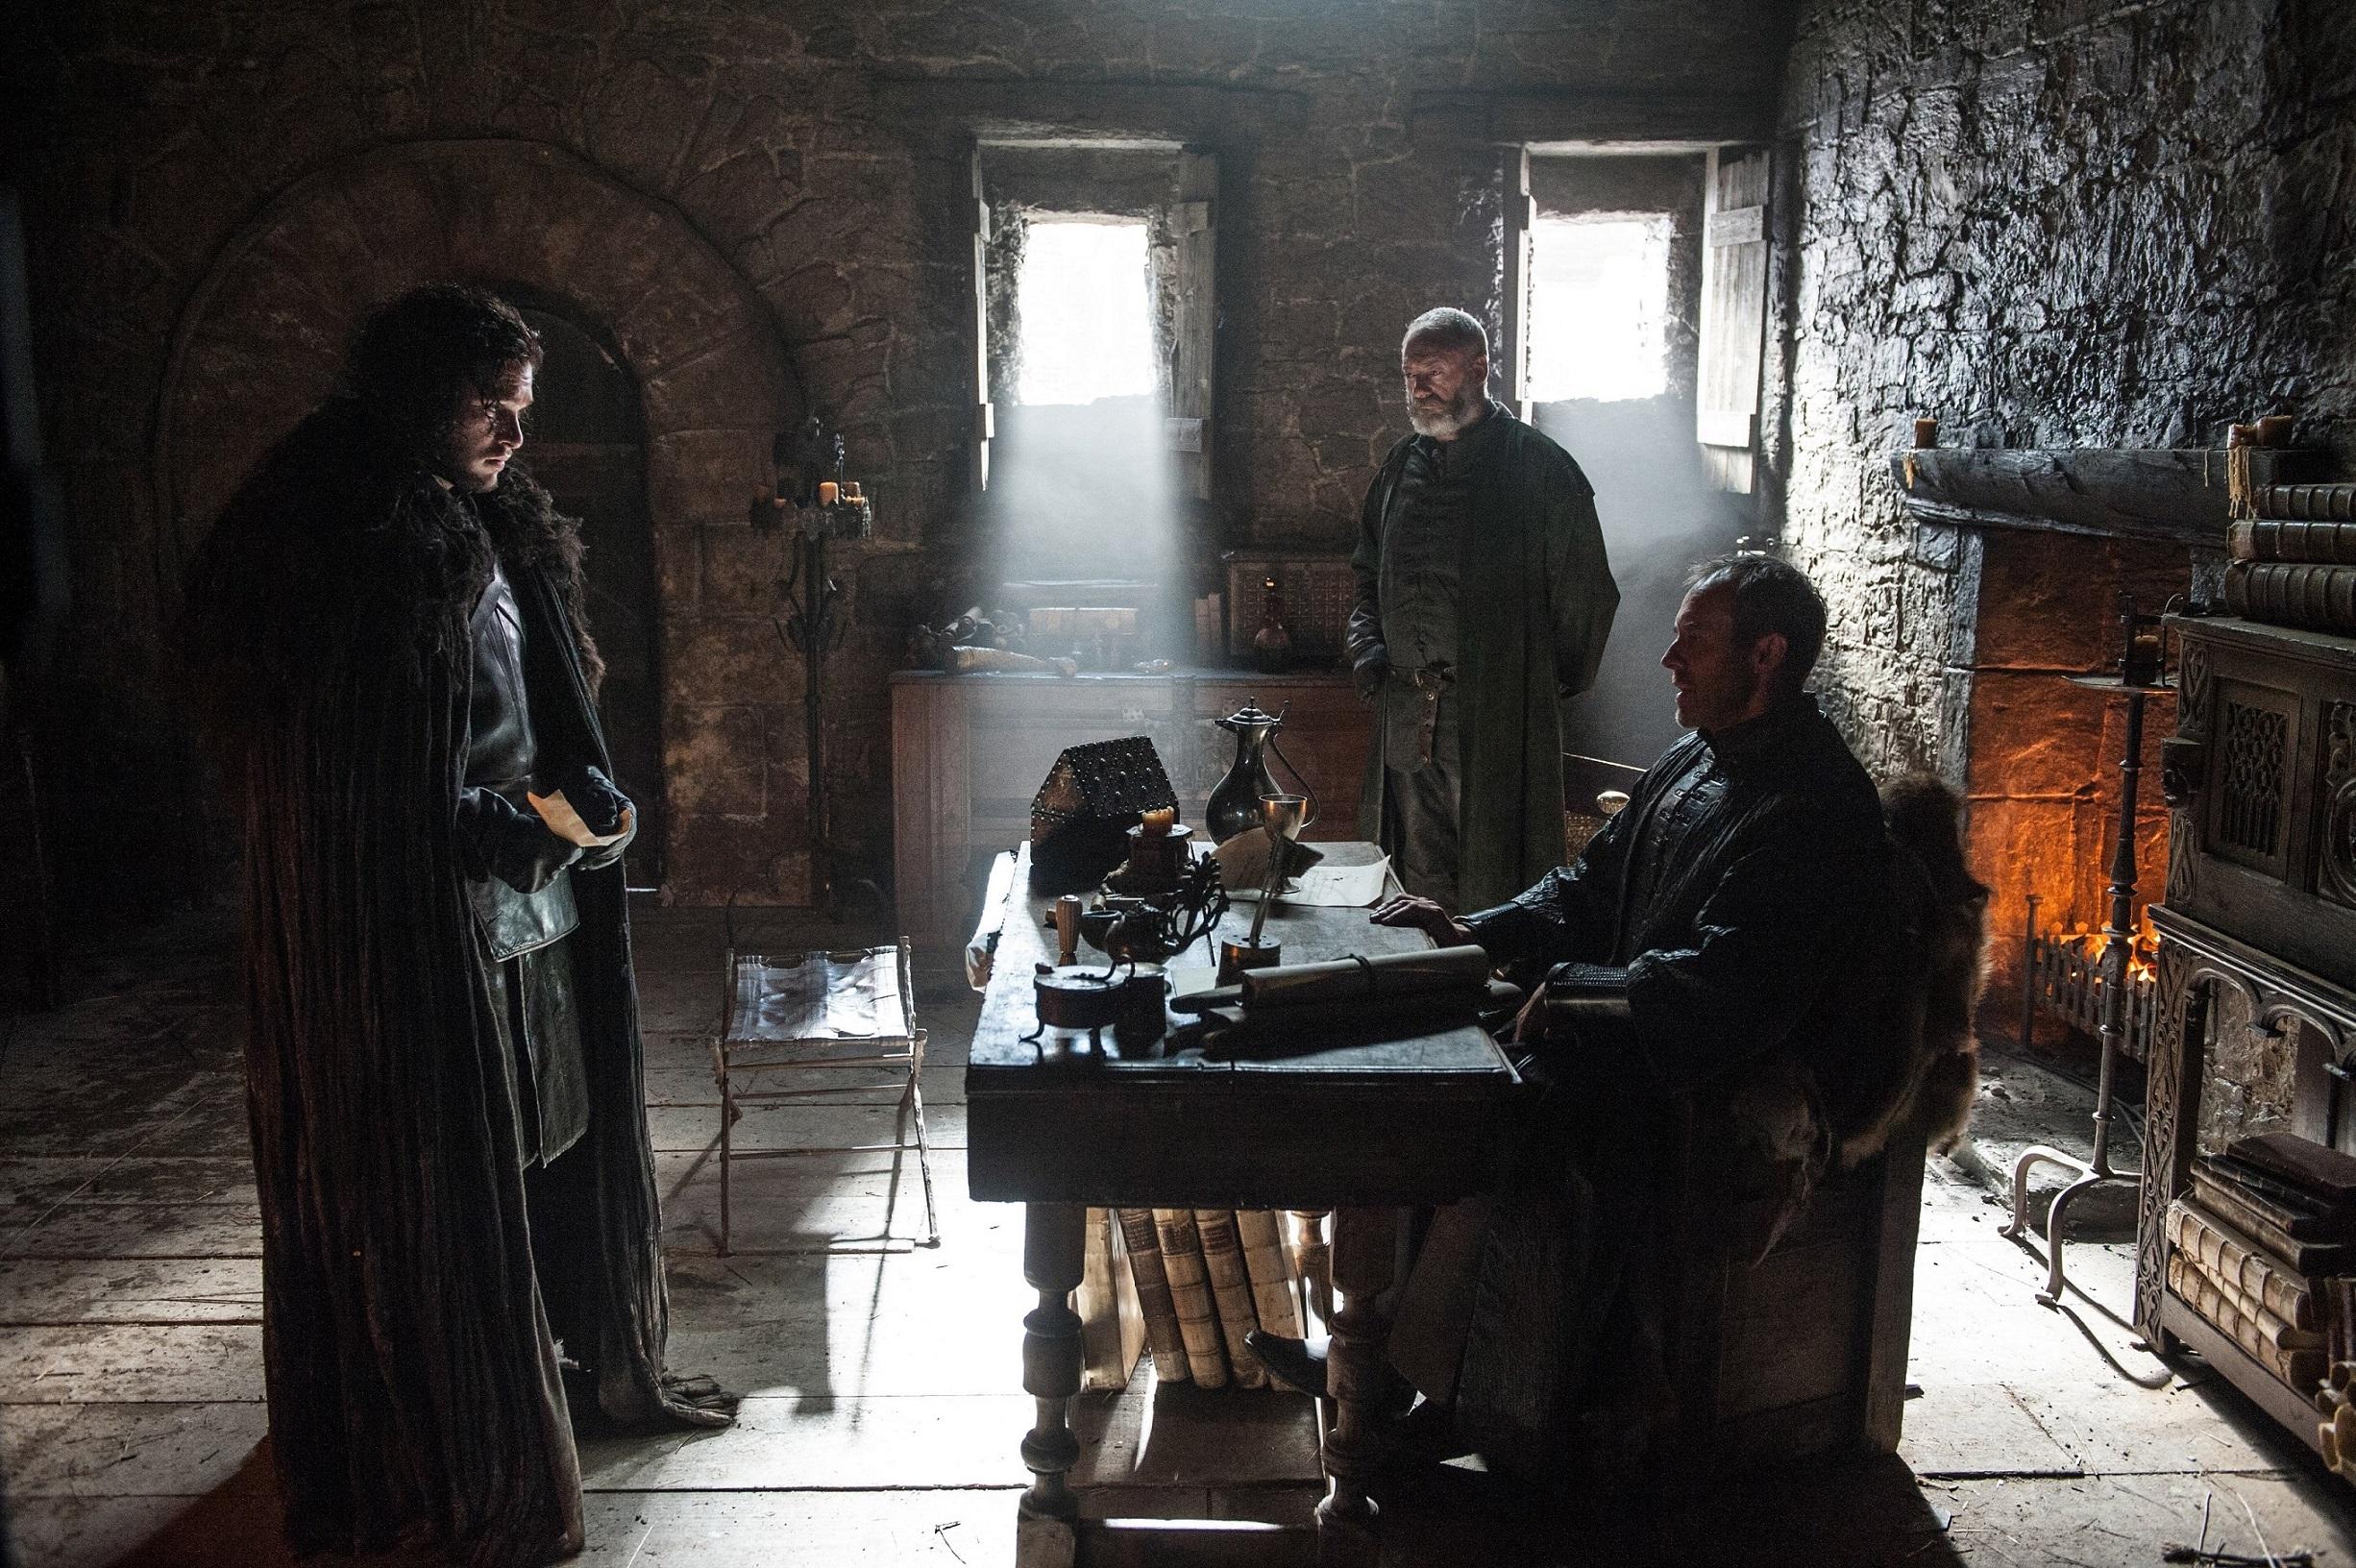 Stannis-Baratheon-Jon-Snow-Davos-Seaworth-Season-5